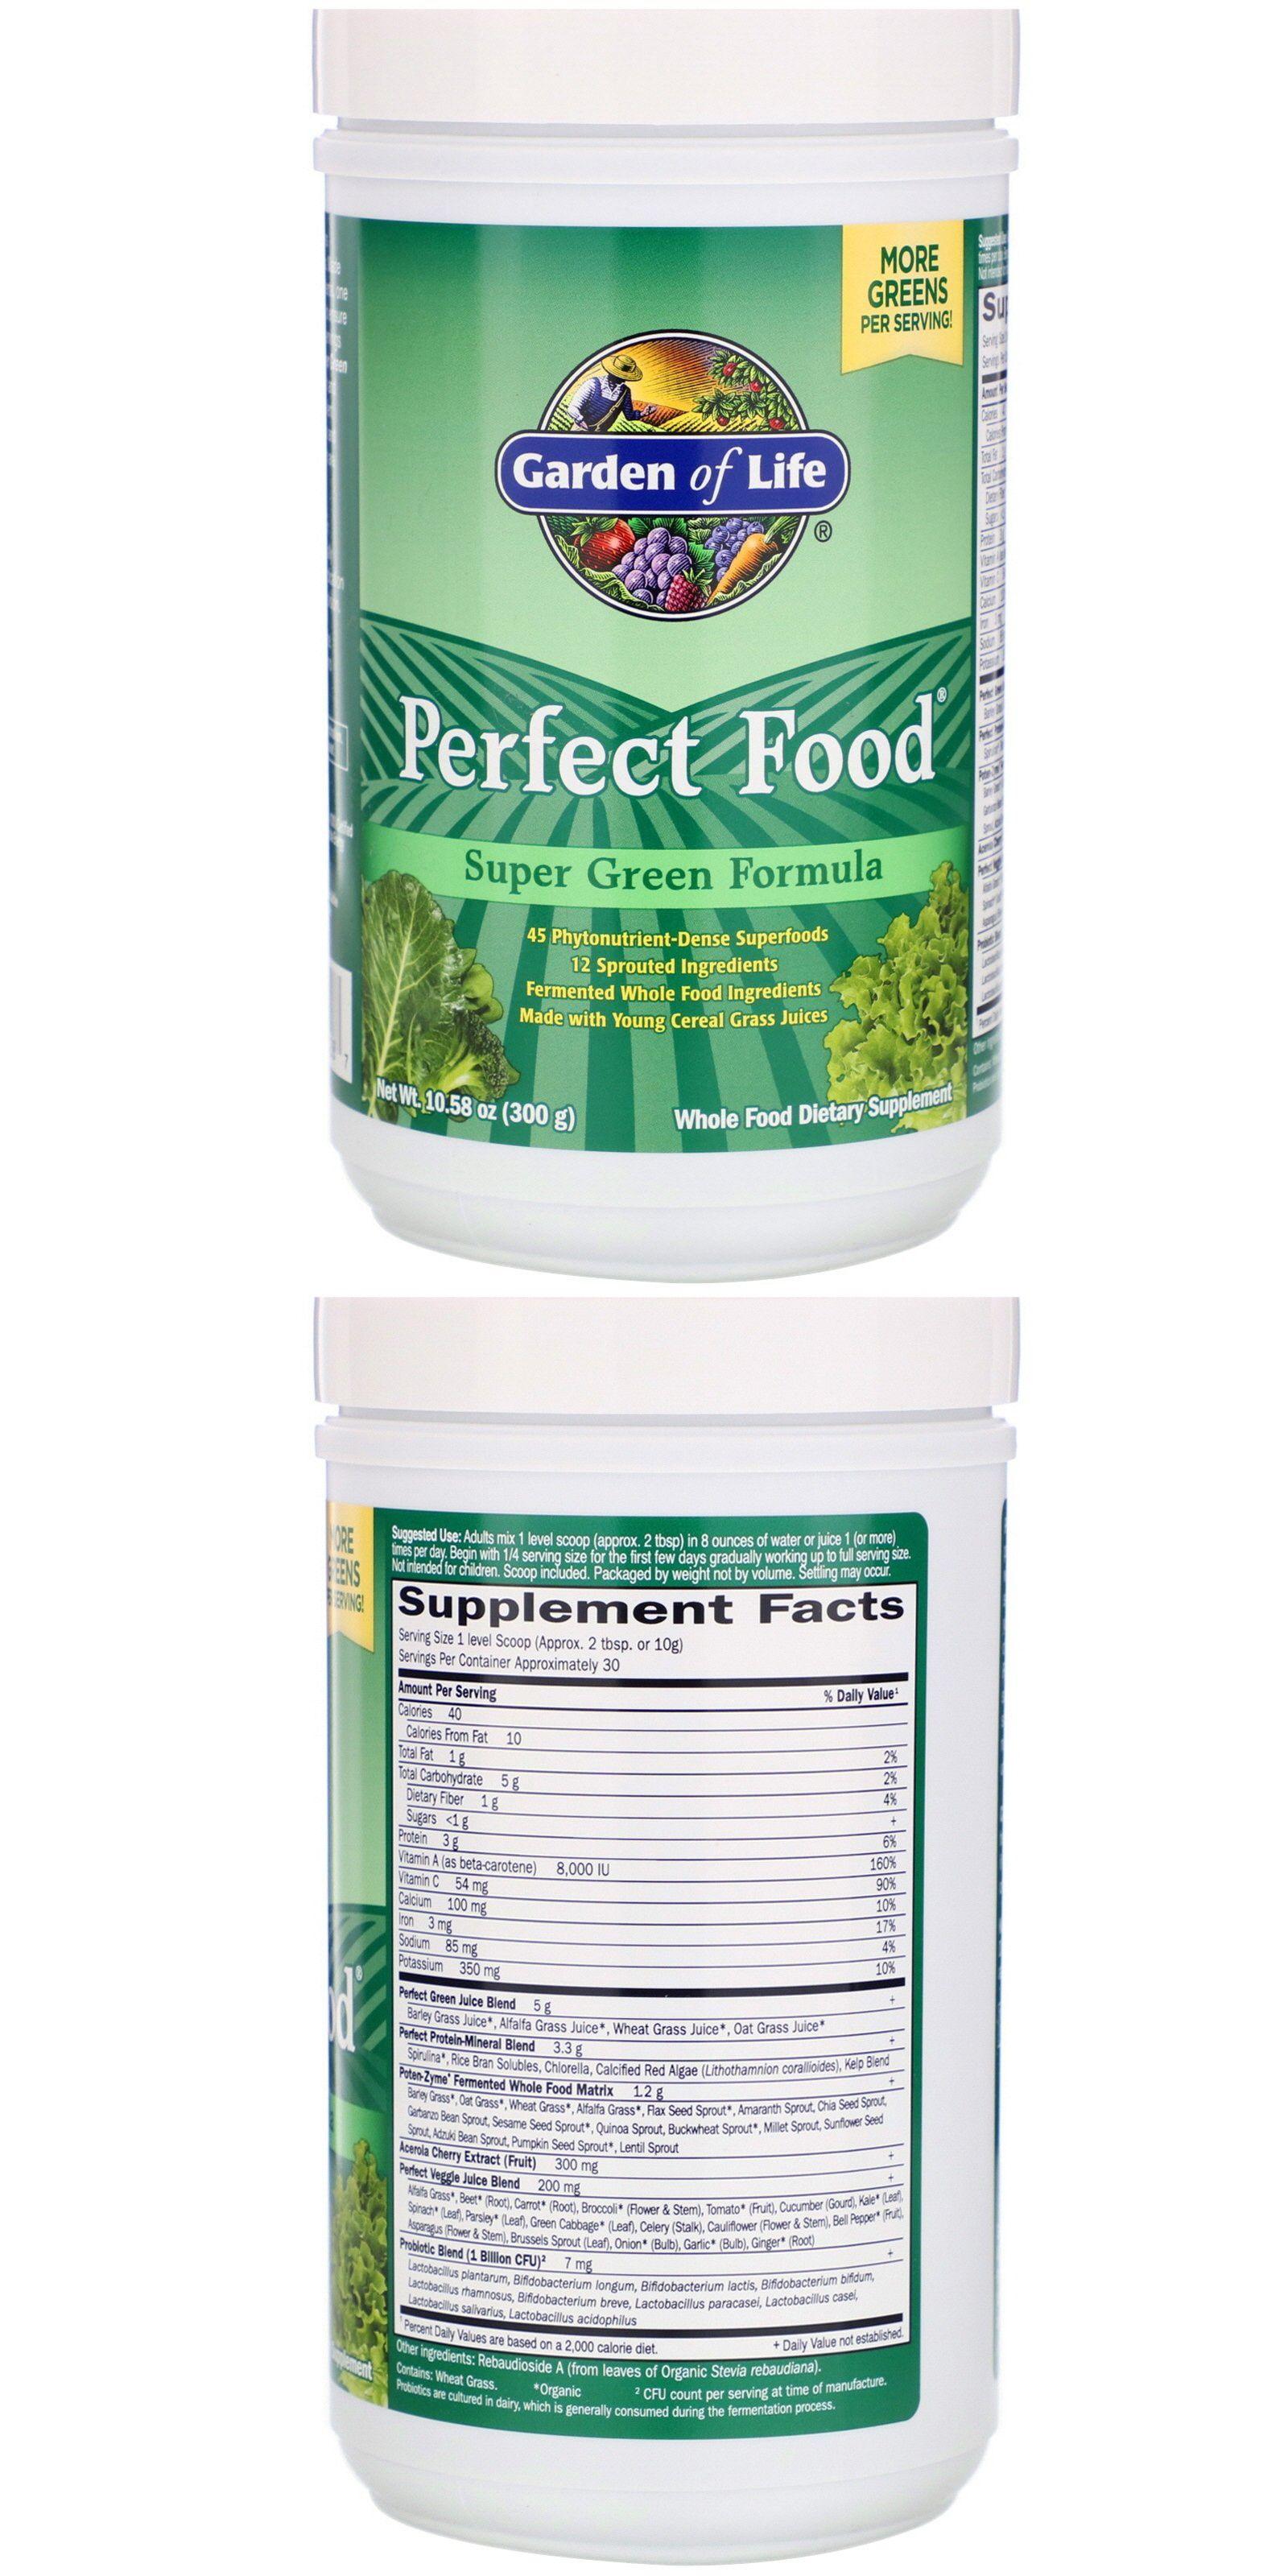 Perfect Food Super Green Formula 10 58 Oz 300 G In 2020 Super Greens Perfect Food Organic Cereal